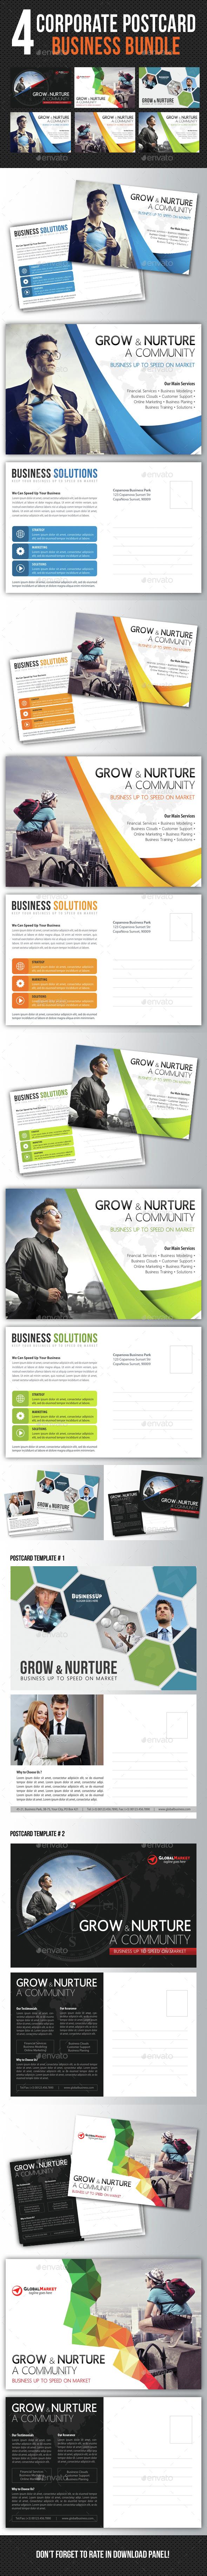 4 in 1 Corporate Business Postcard Bundle V03 - Cards & Invites Print Templates